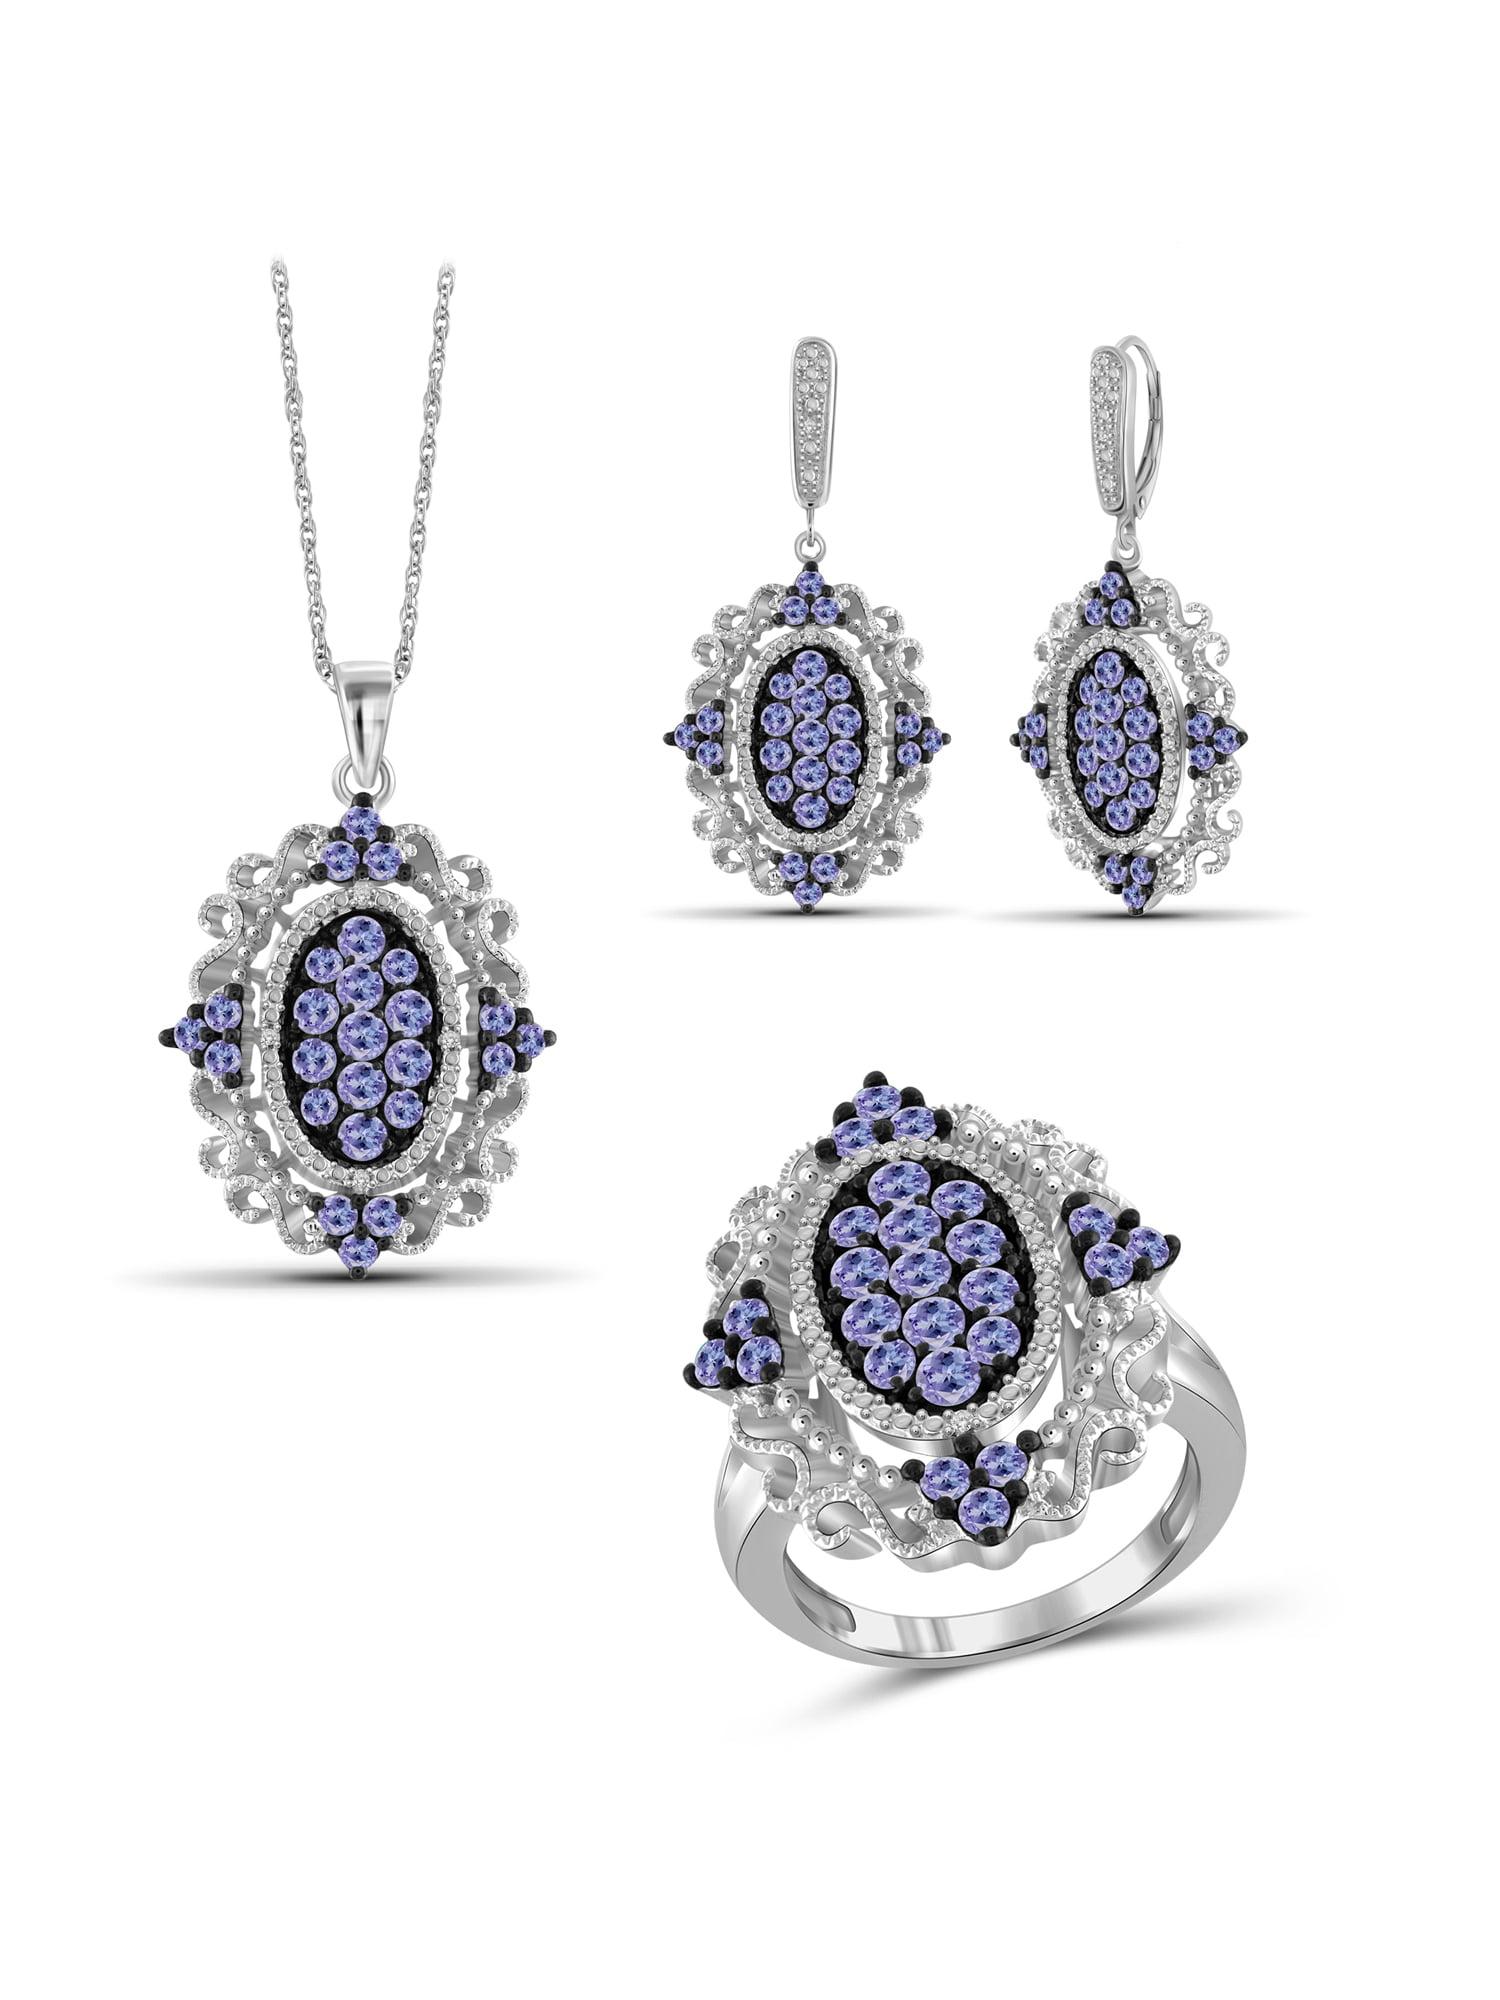 JewelersClub 5.00 Carat T.G.W. Tanzanite And White Diamond Accent Sterling Silver 3-Piece Jewelry set by JewelersClub